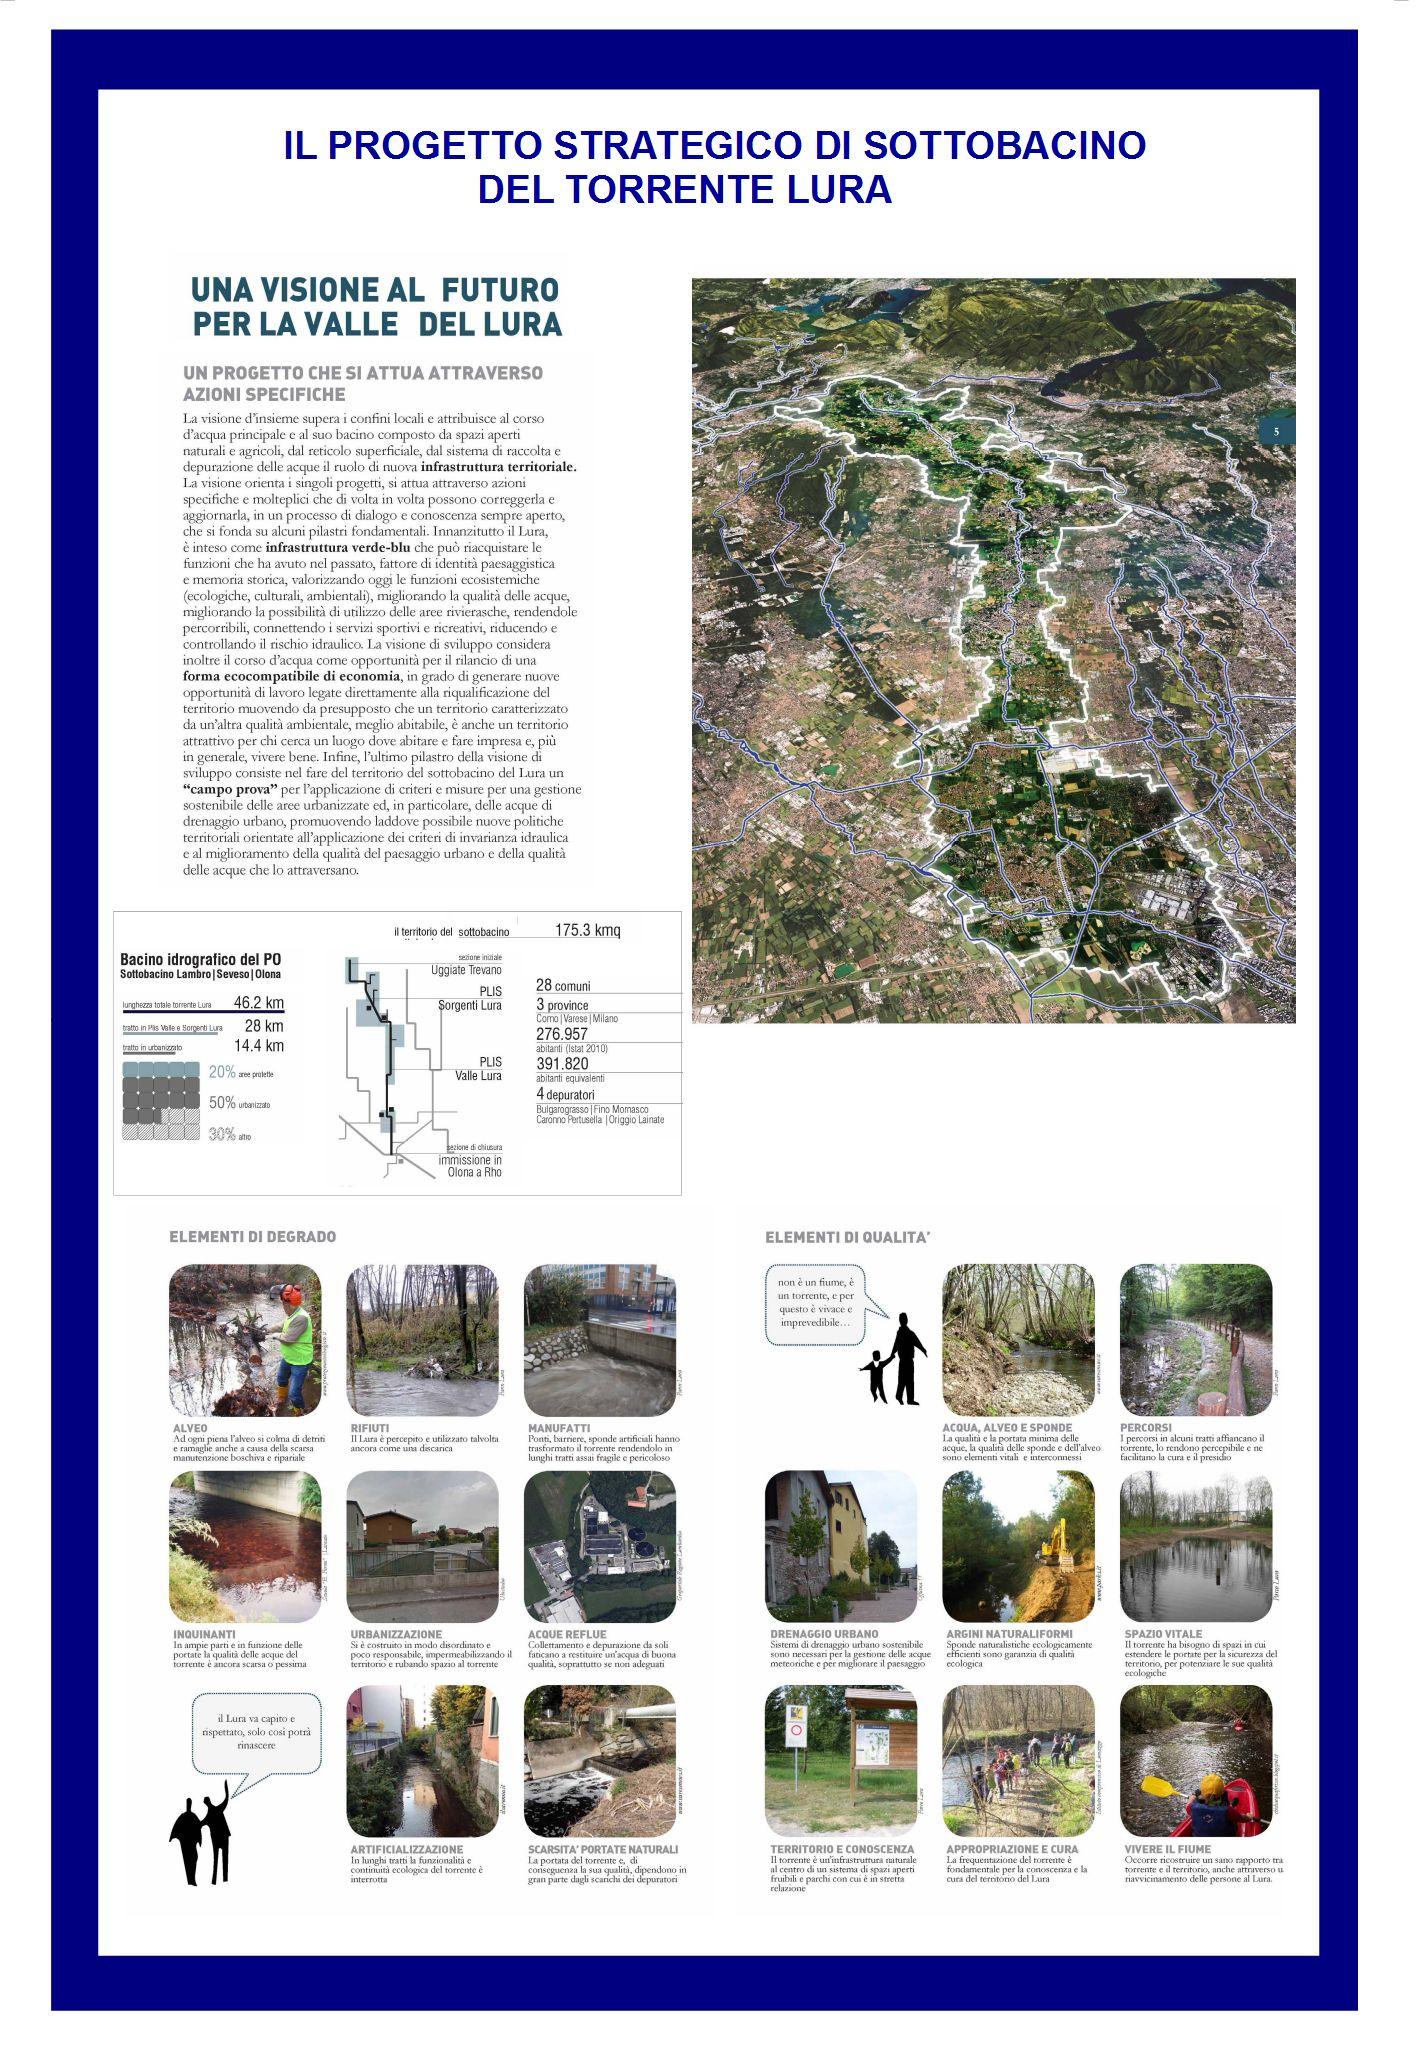 Awesome Punto Blu Terrazzano Images - Idee Arredamento Casa - hirepro.us